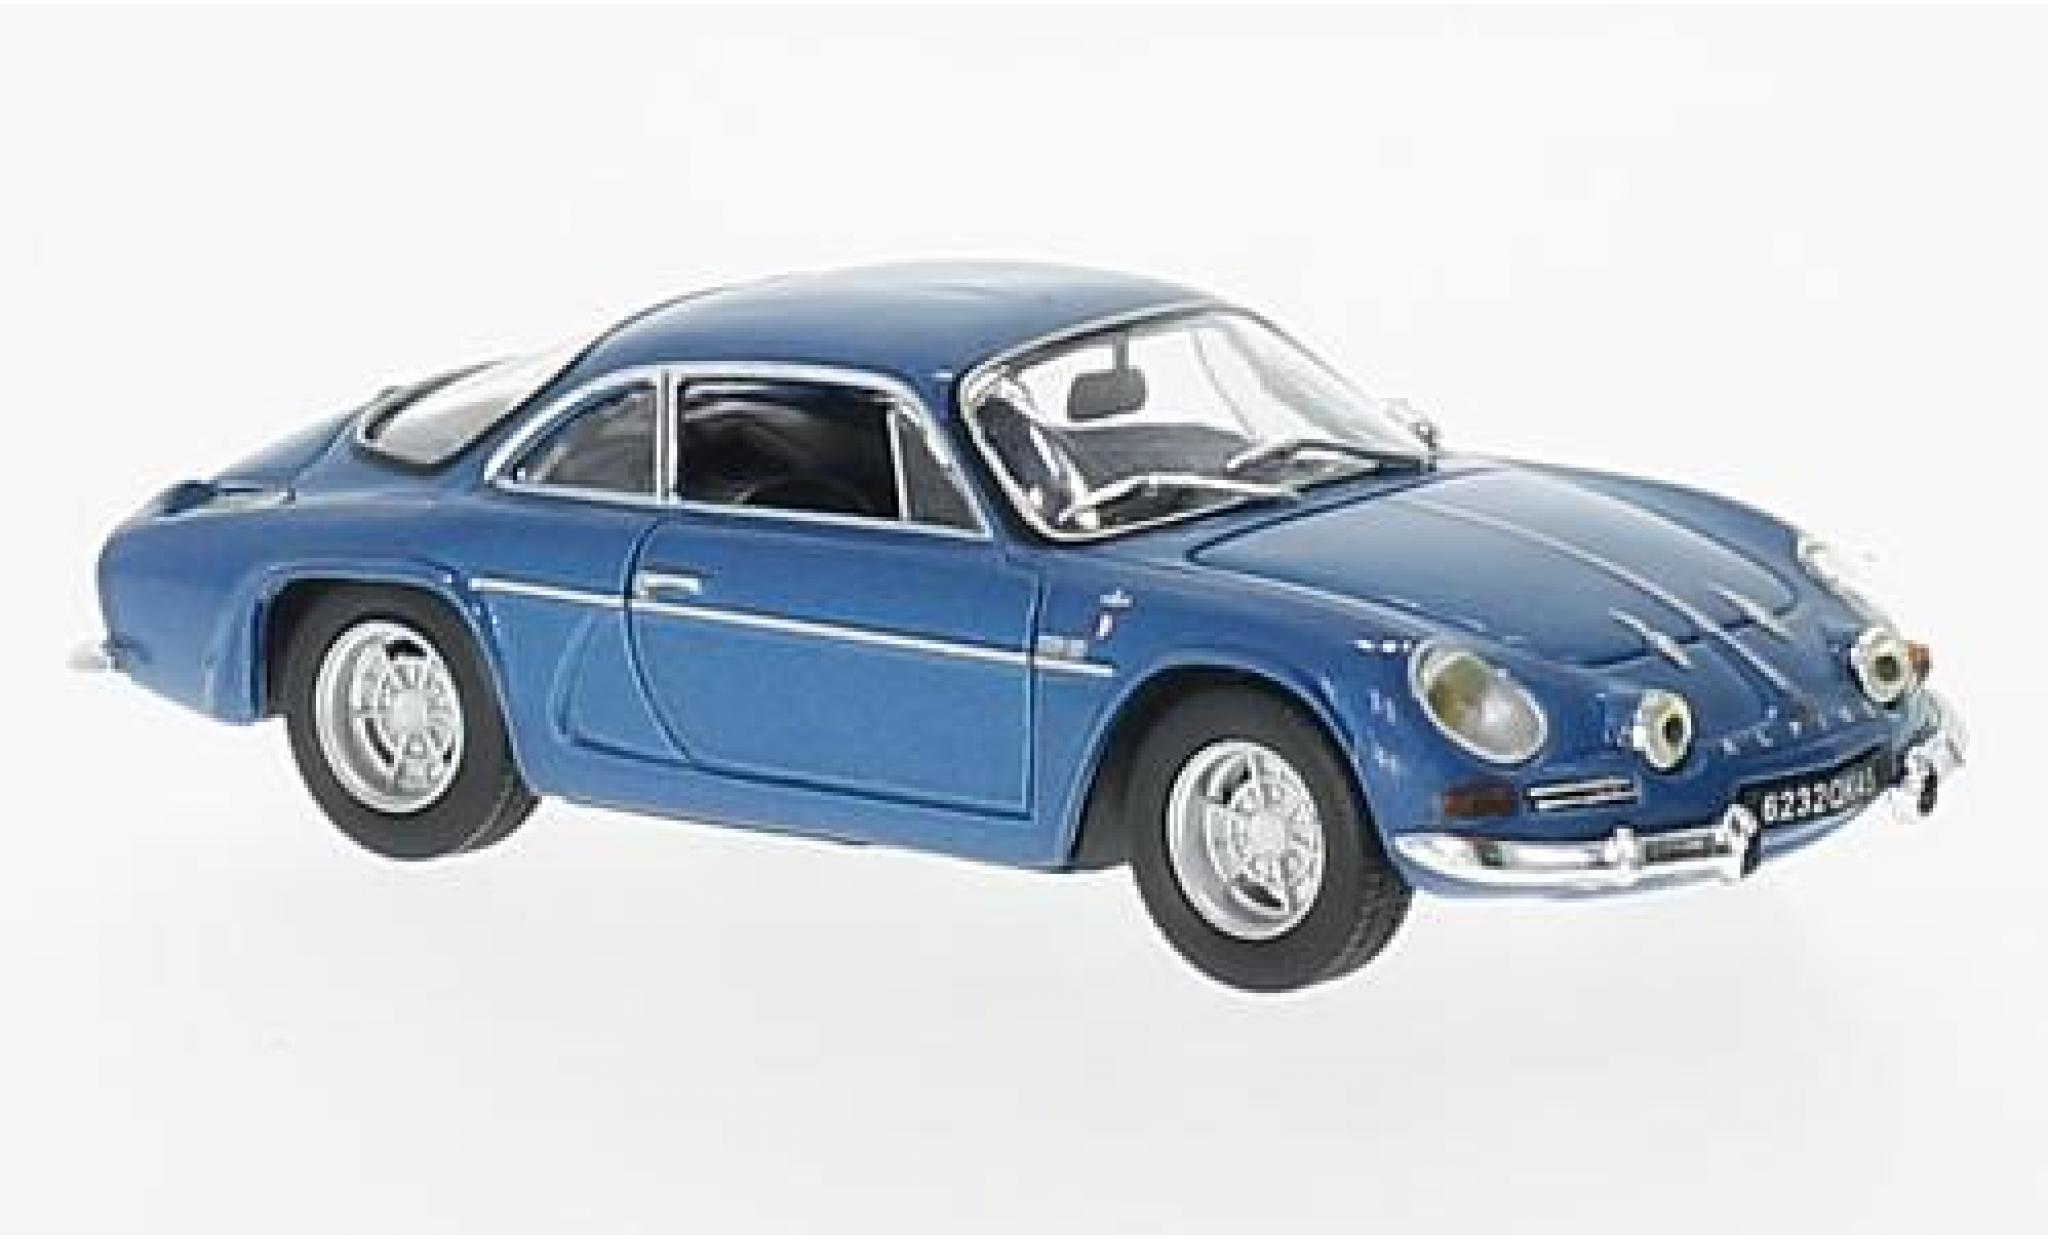 Alpine A110 1/43 Norev Renault A 110 metallise bleue 1973